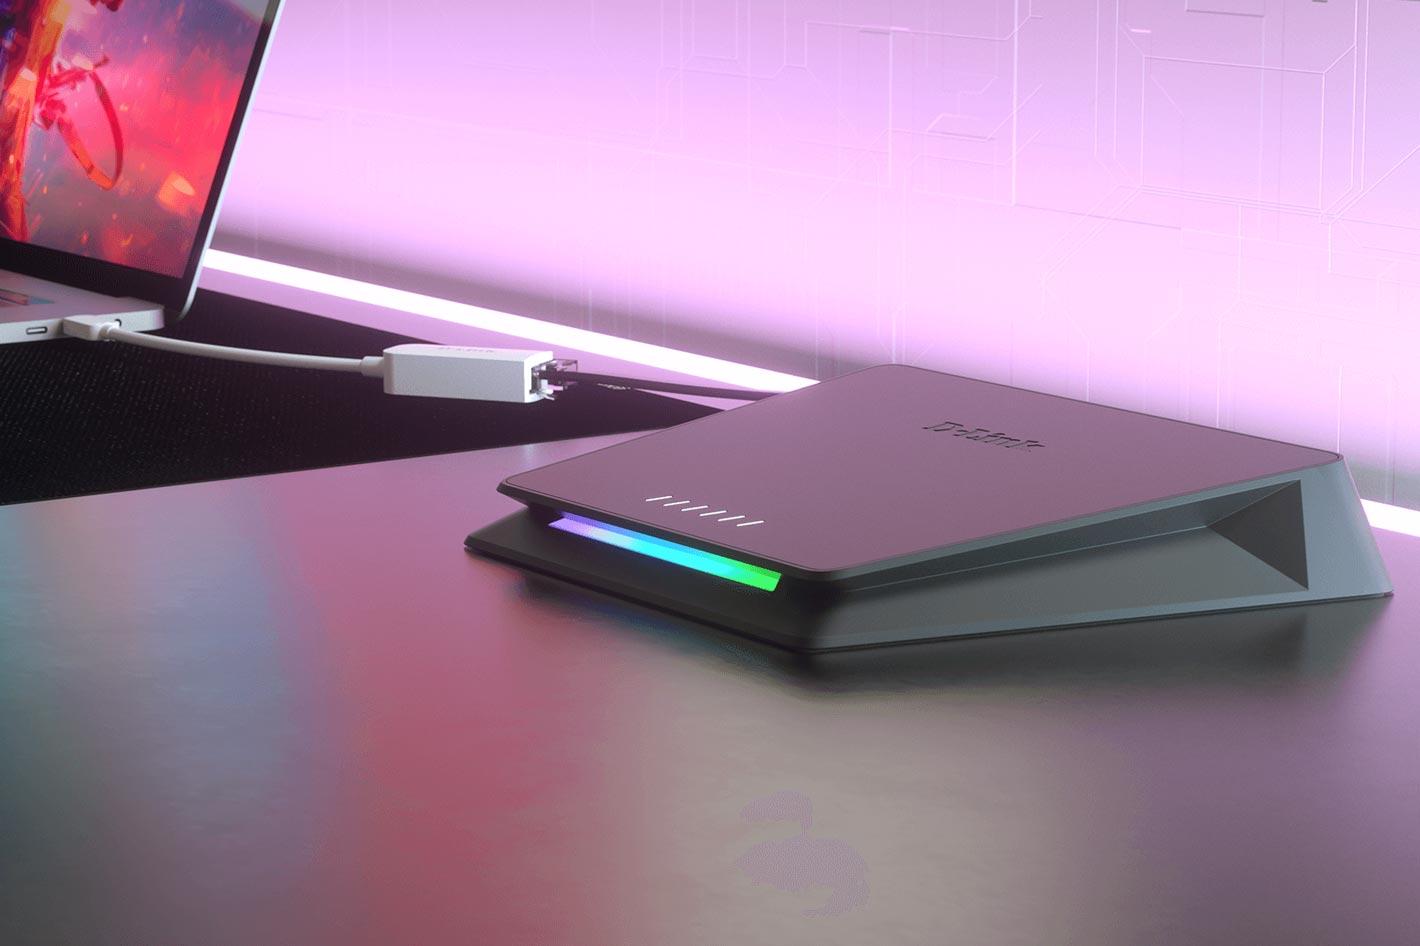 D-Link introduces a new USB-C 2.5 Gigabit Ethernet adapter